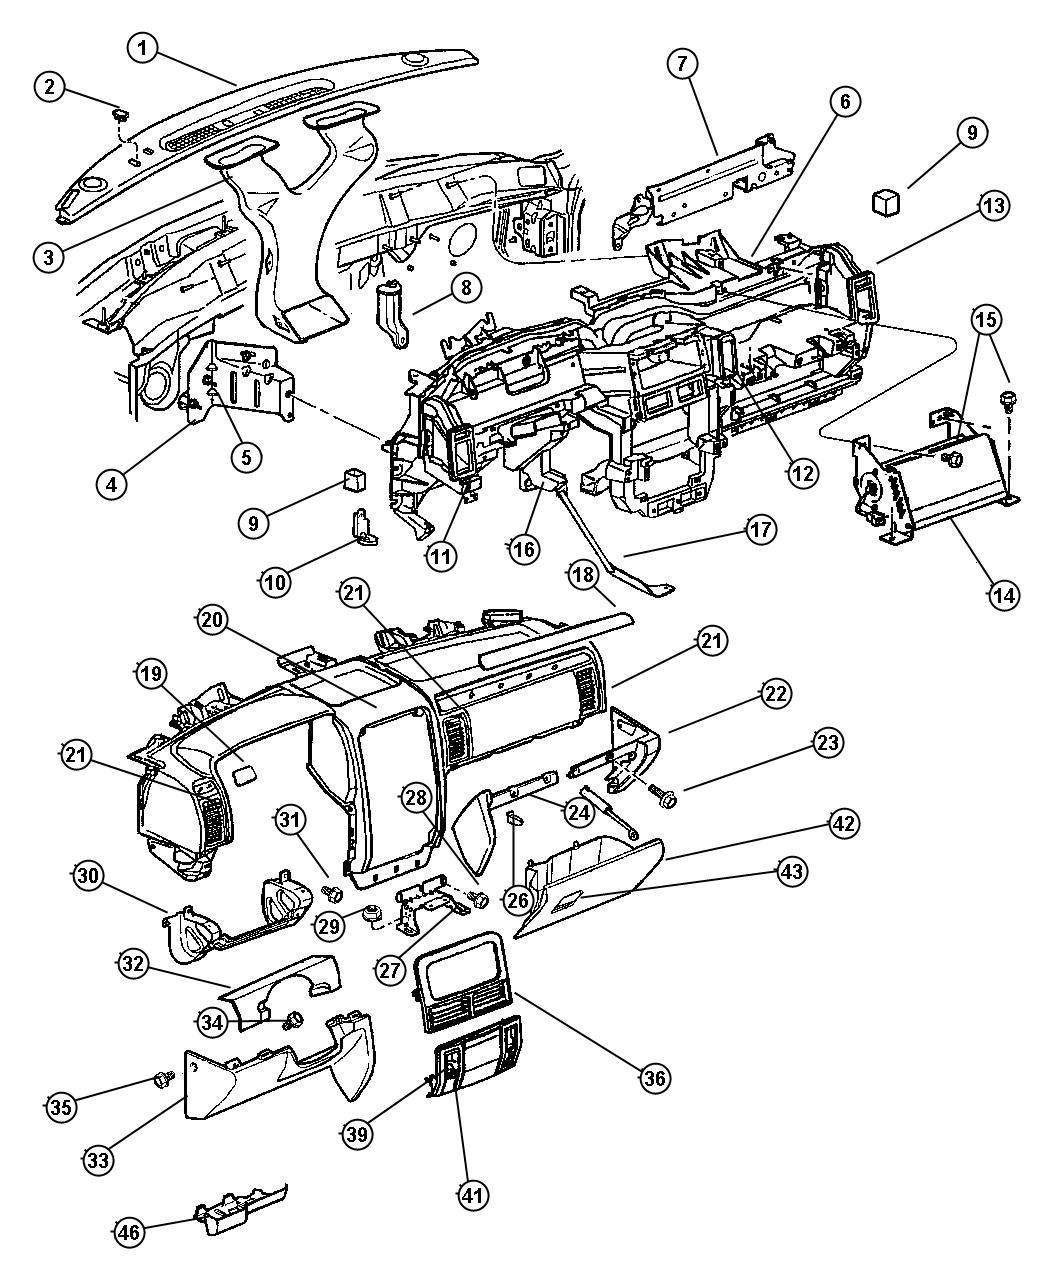 2003 Jeep Grand Cherokee Bezel. Instrument panel